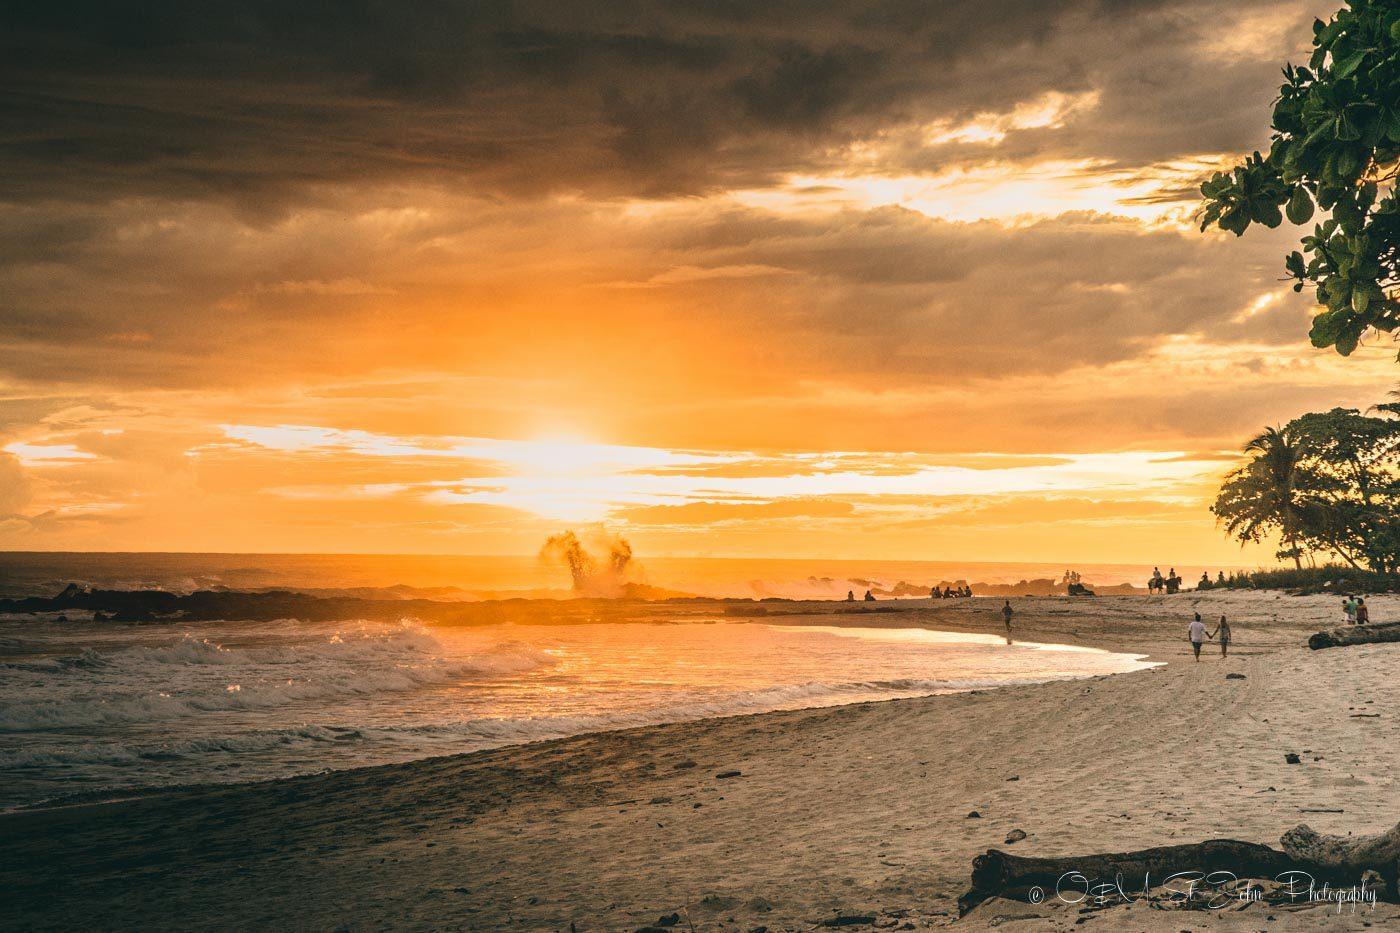 Costa Rica itinerary: Sunset views from Playa Cielo in Santa Teresa, Costa Rica